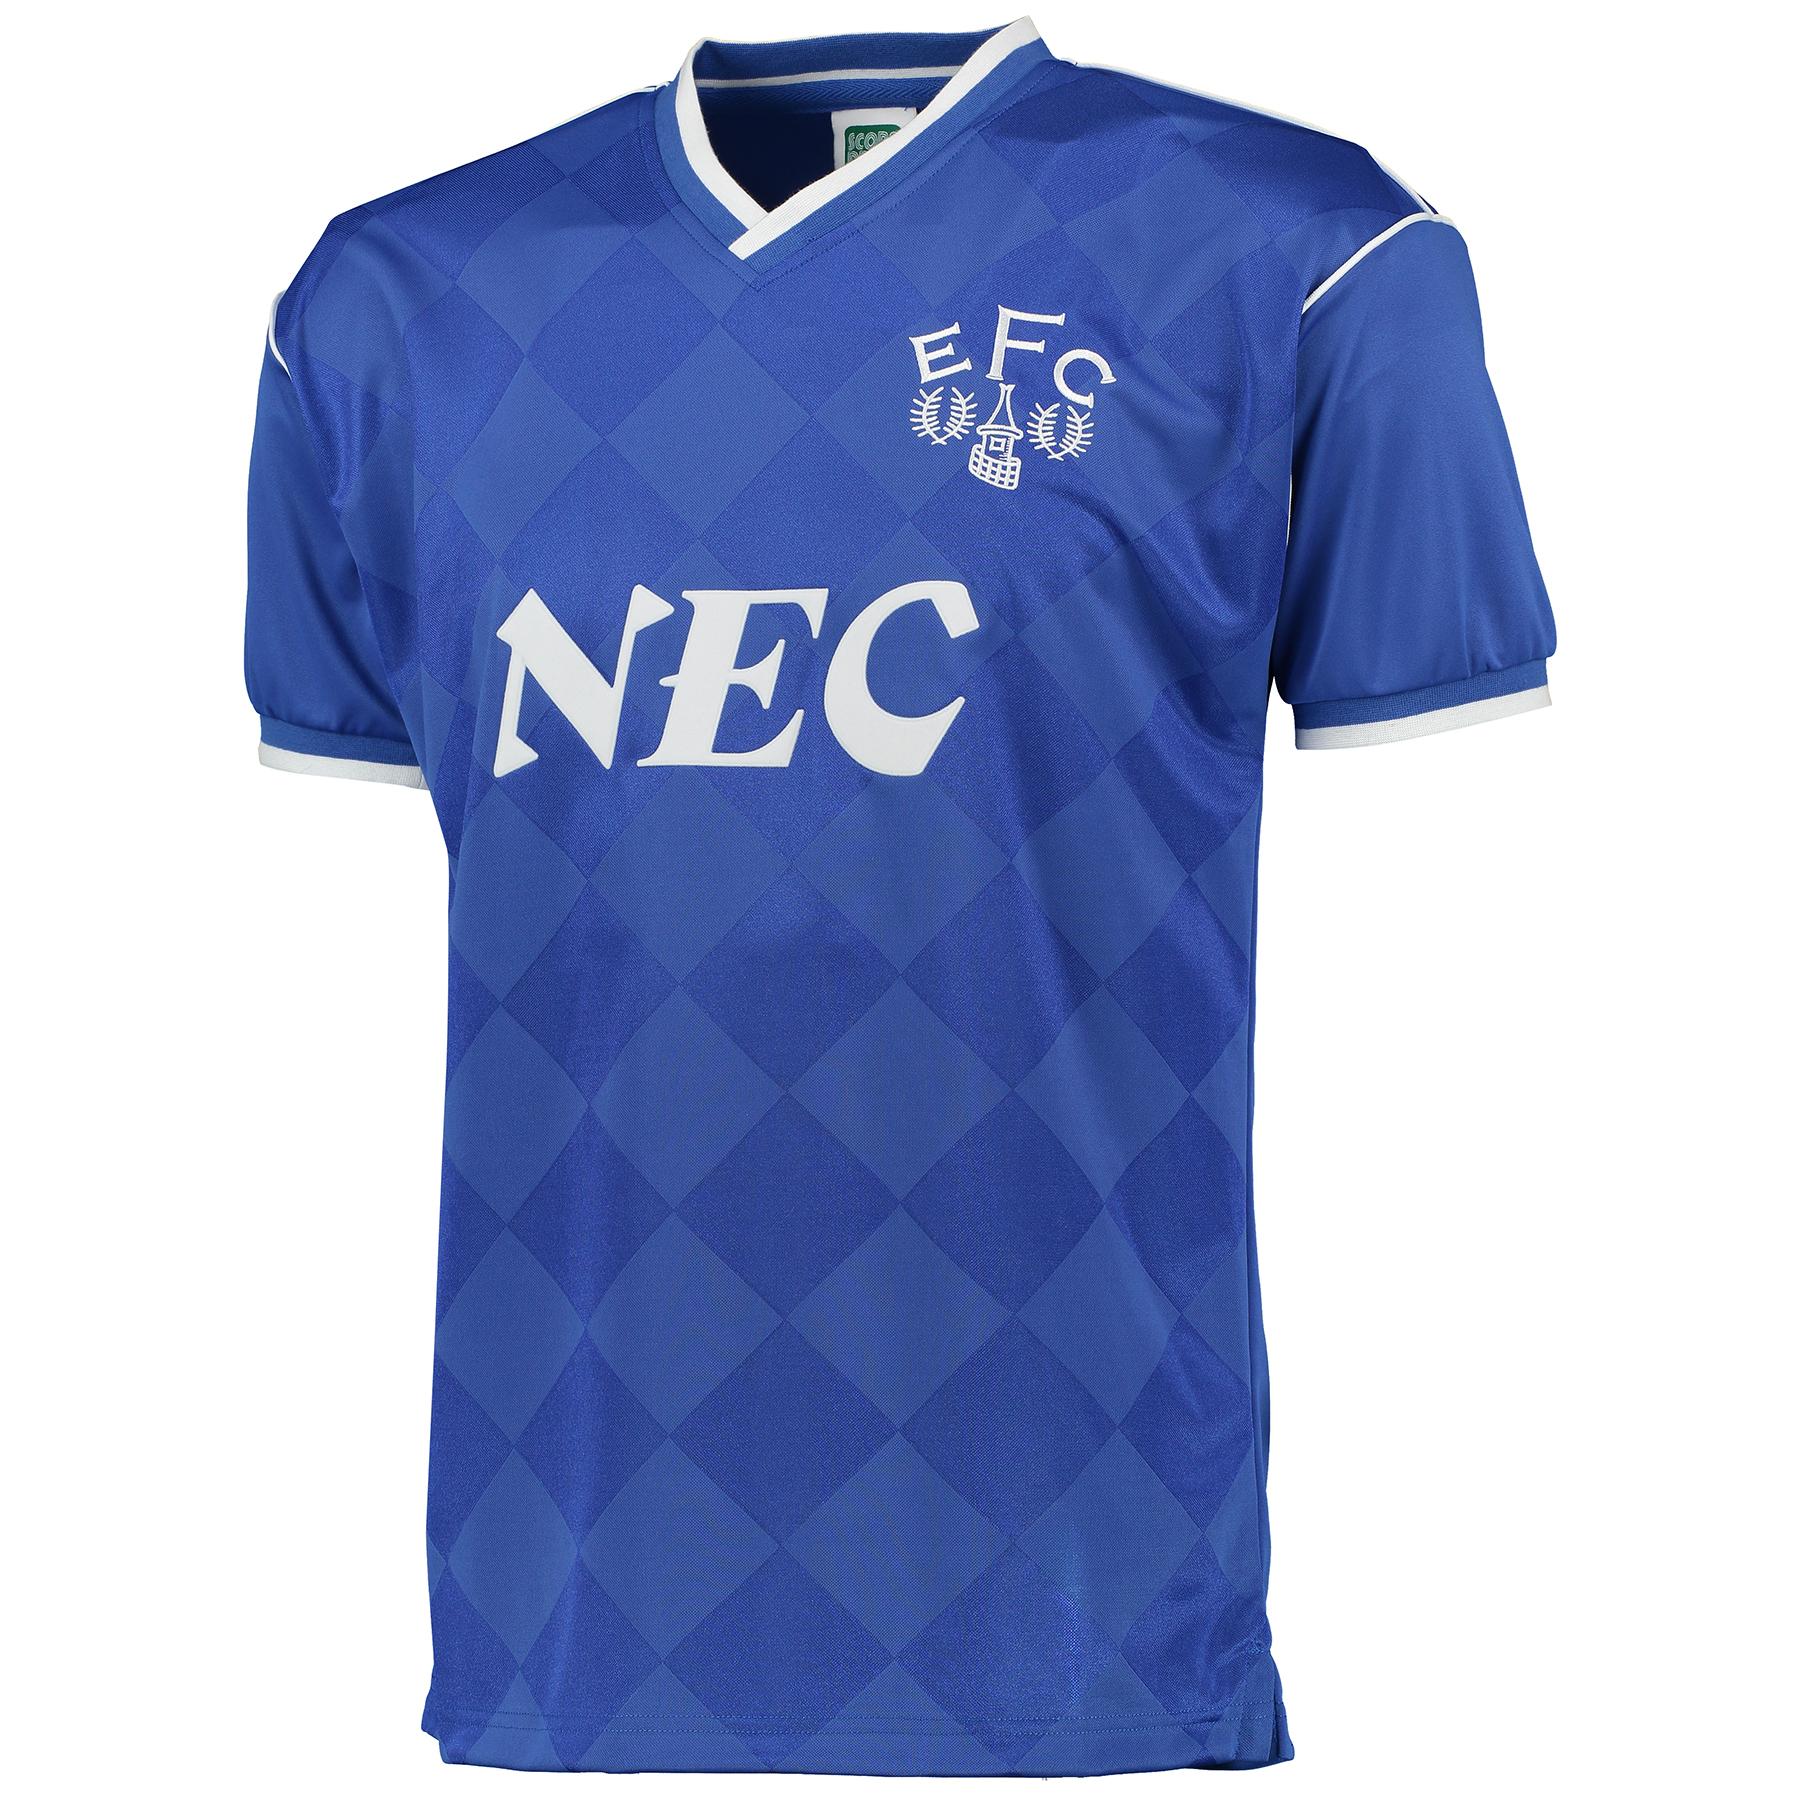 Image of Everton 1987 Shirt